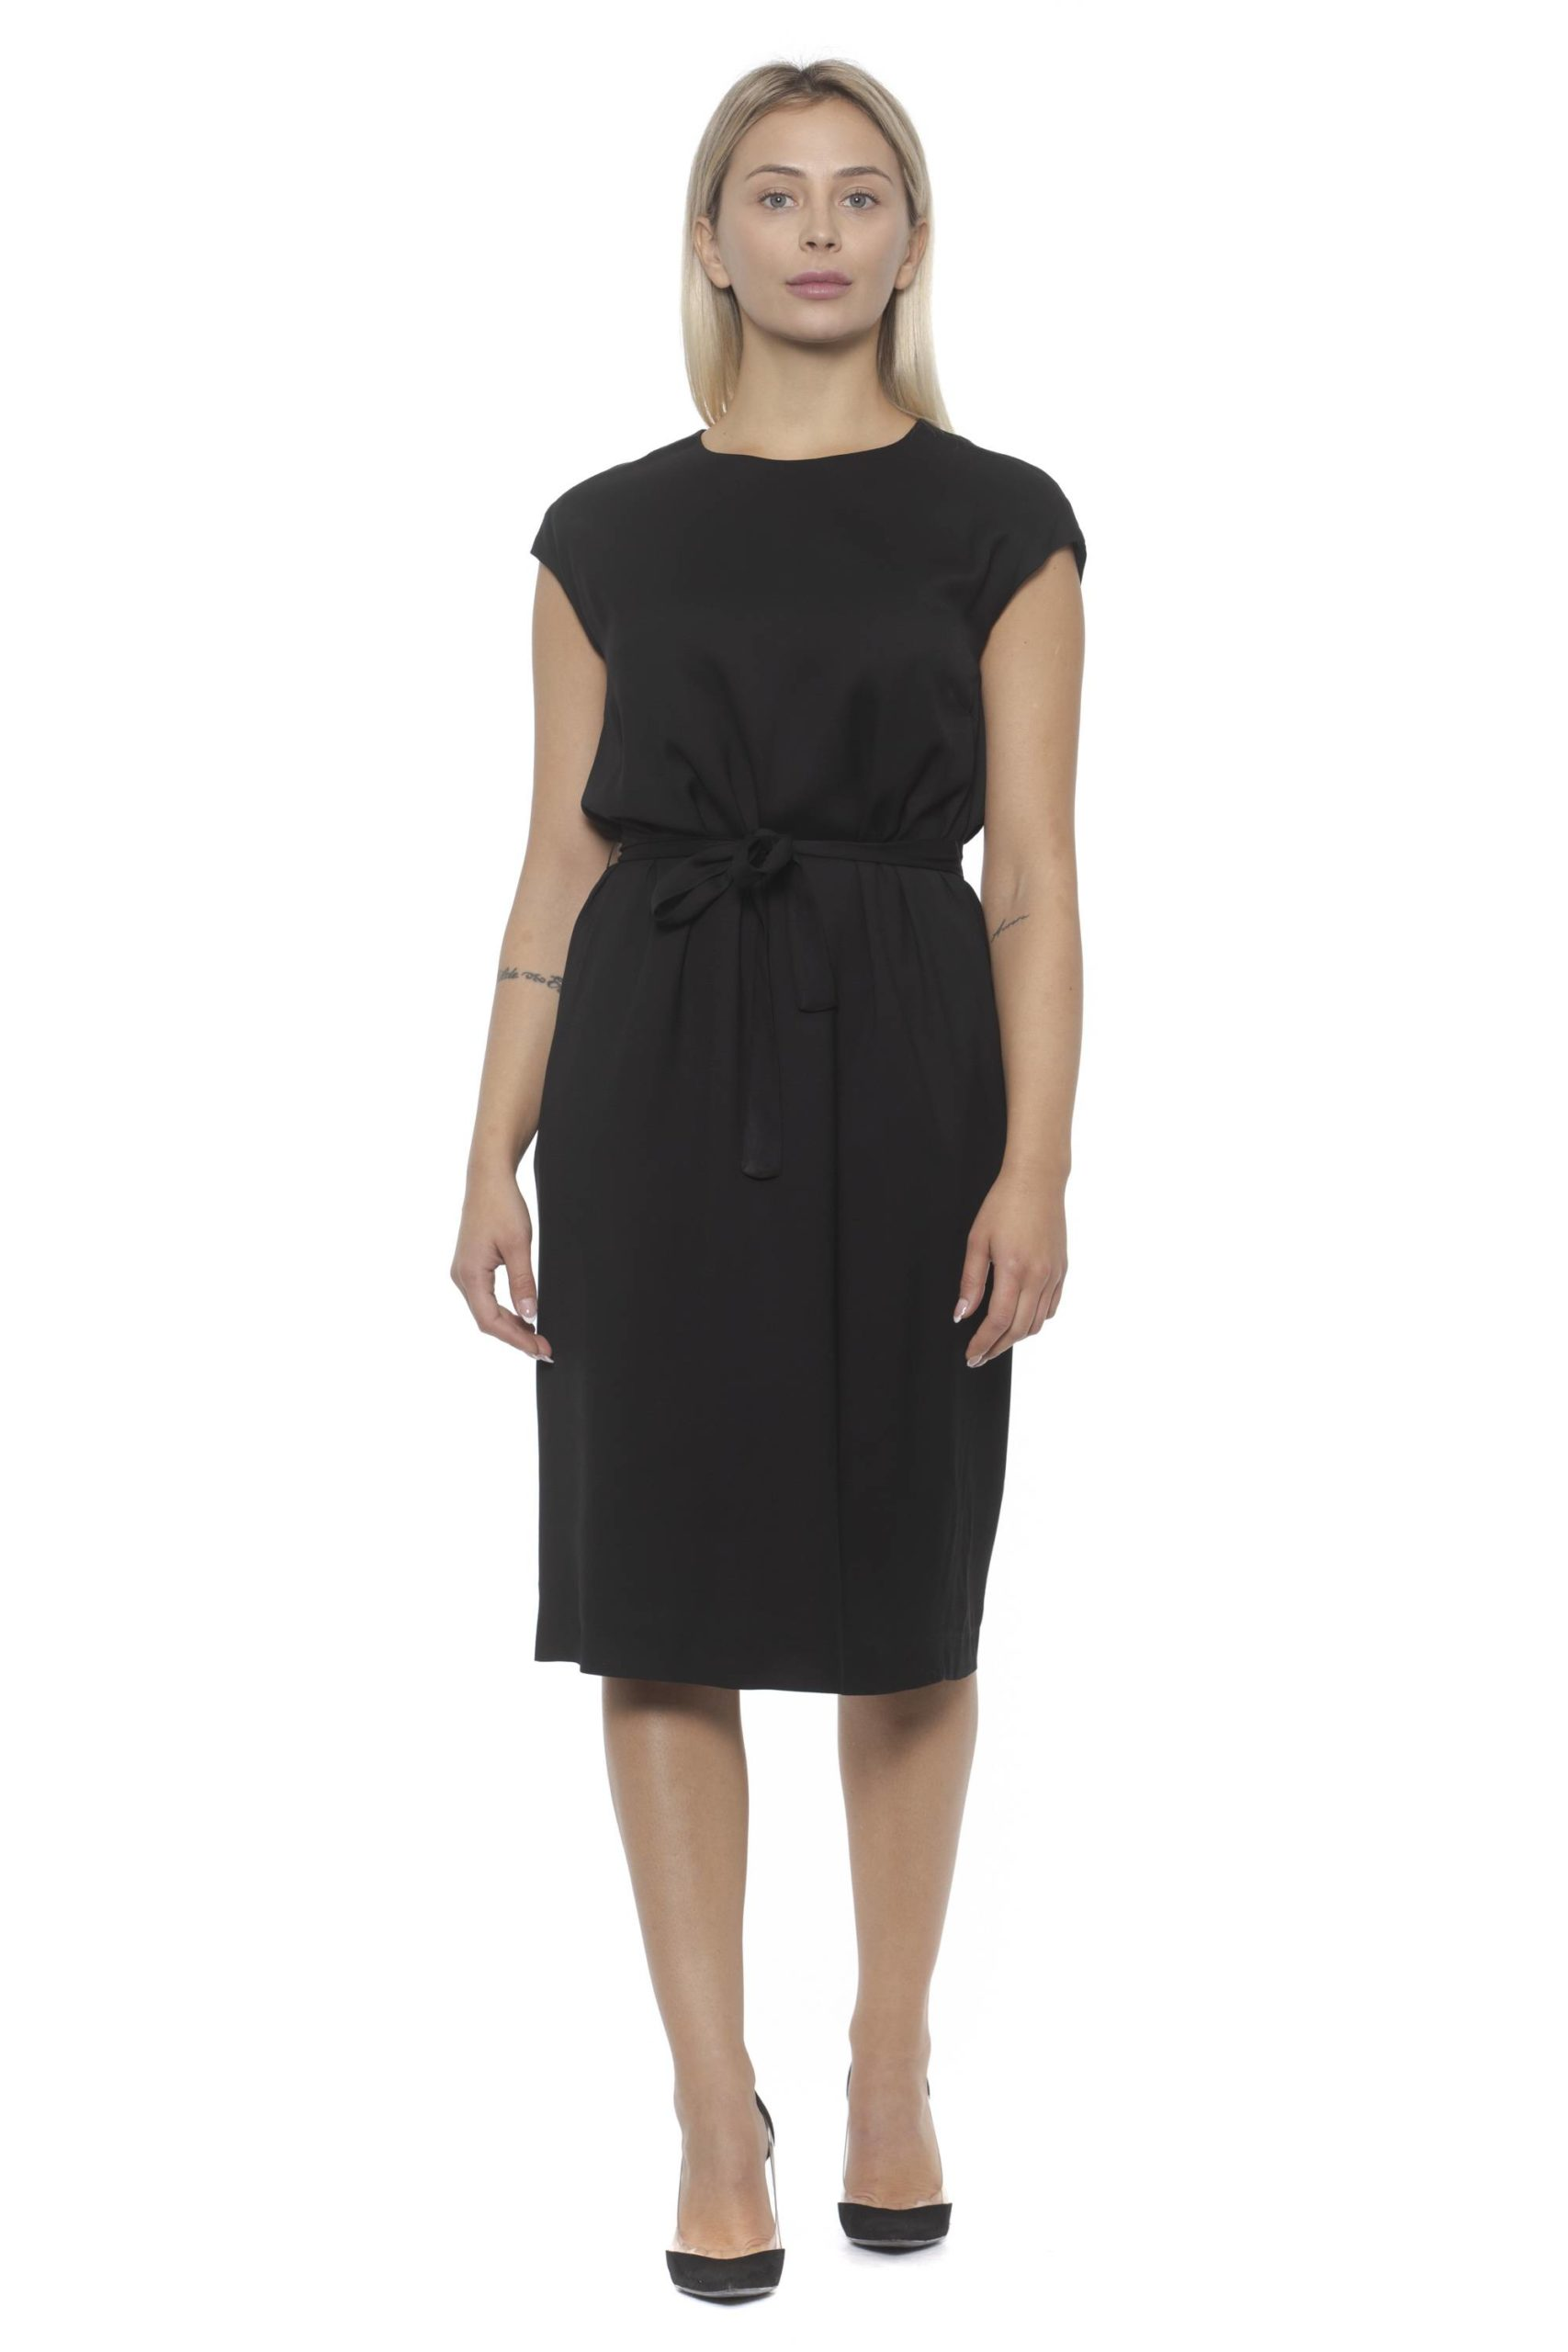 Peserico Women's Nero Dress Black PE1383172 - IT42 | S